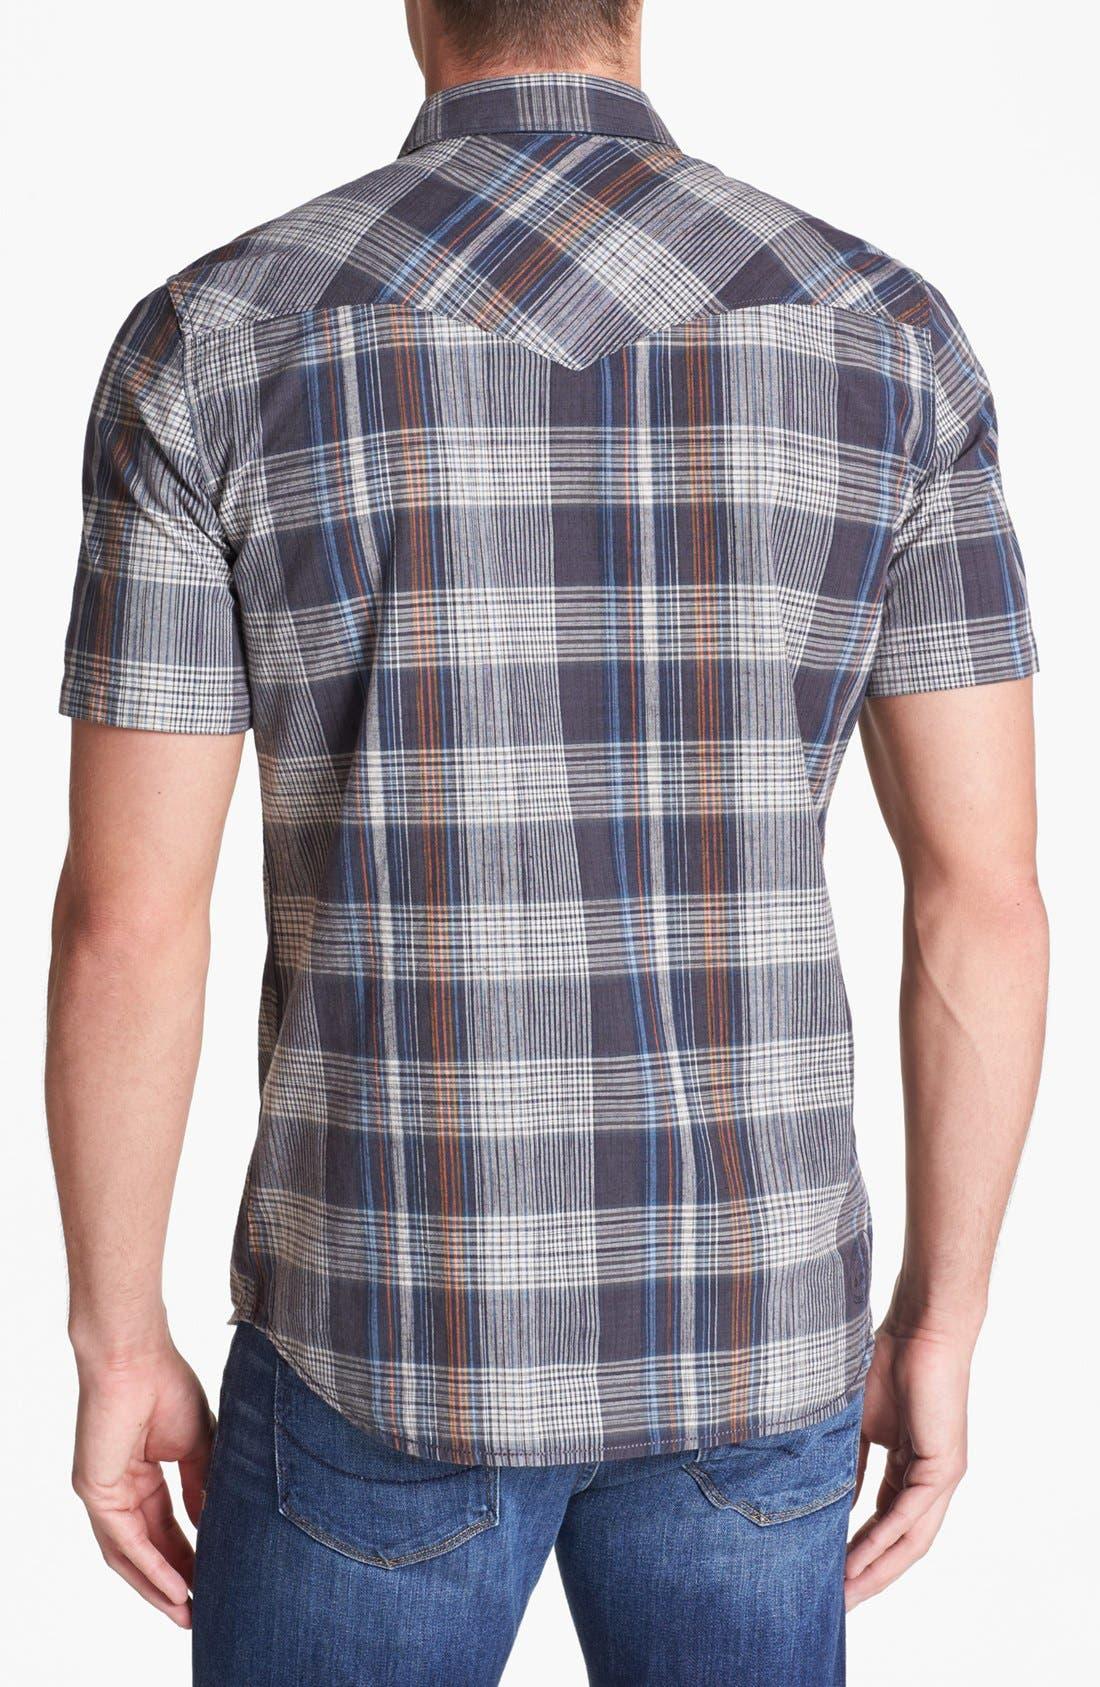 Alternate Image 3  - Vans 'Windsor' Plaid Woven Shirt